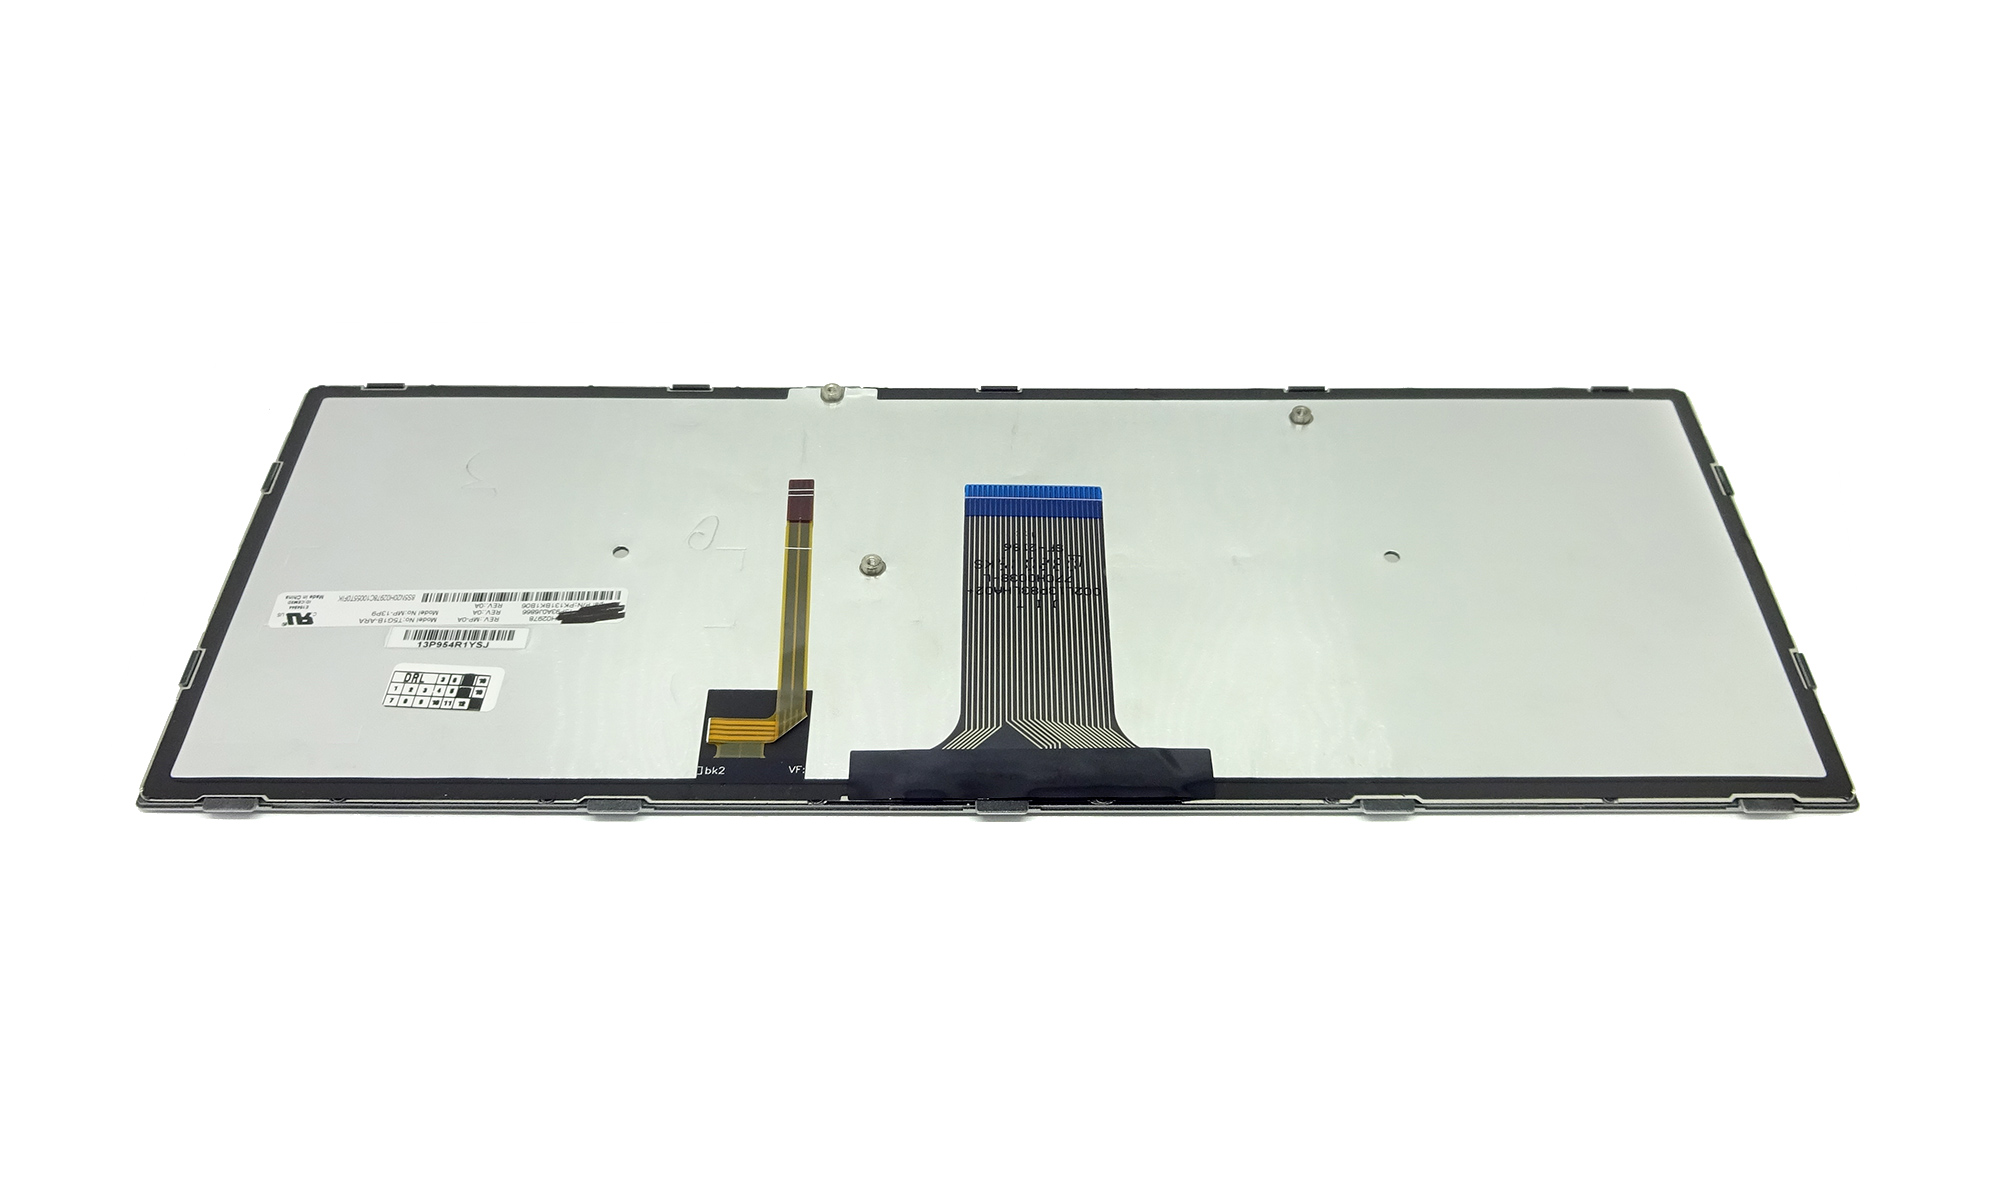 Tastatura compatibila Lenovo G40-30, G40-45, G40-70, G40-70m, G40-80, Z40-70, Z40-75, Ideapad Flex 2-14, rama argintie, cu iluminare, layout US